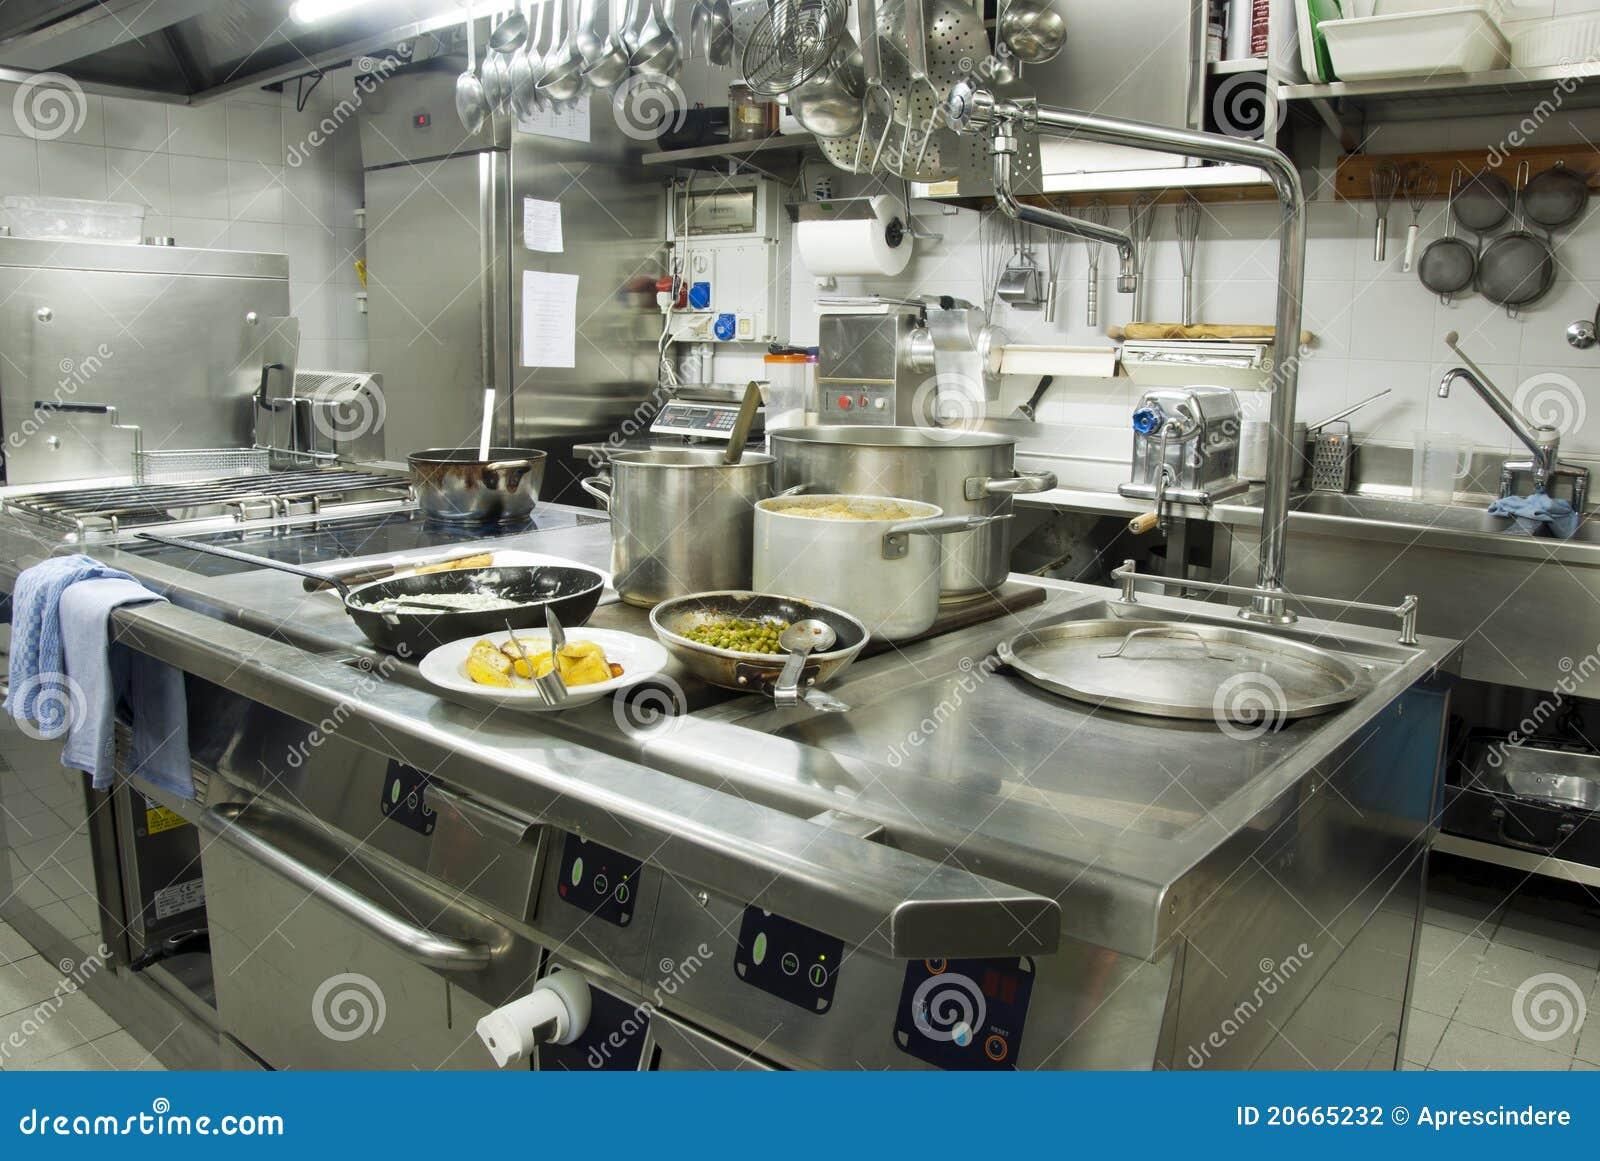 big luxury restaurant kitchen stock images - image: 2318544